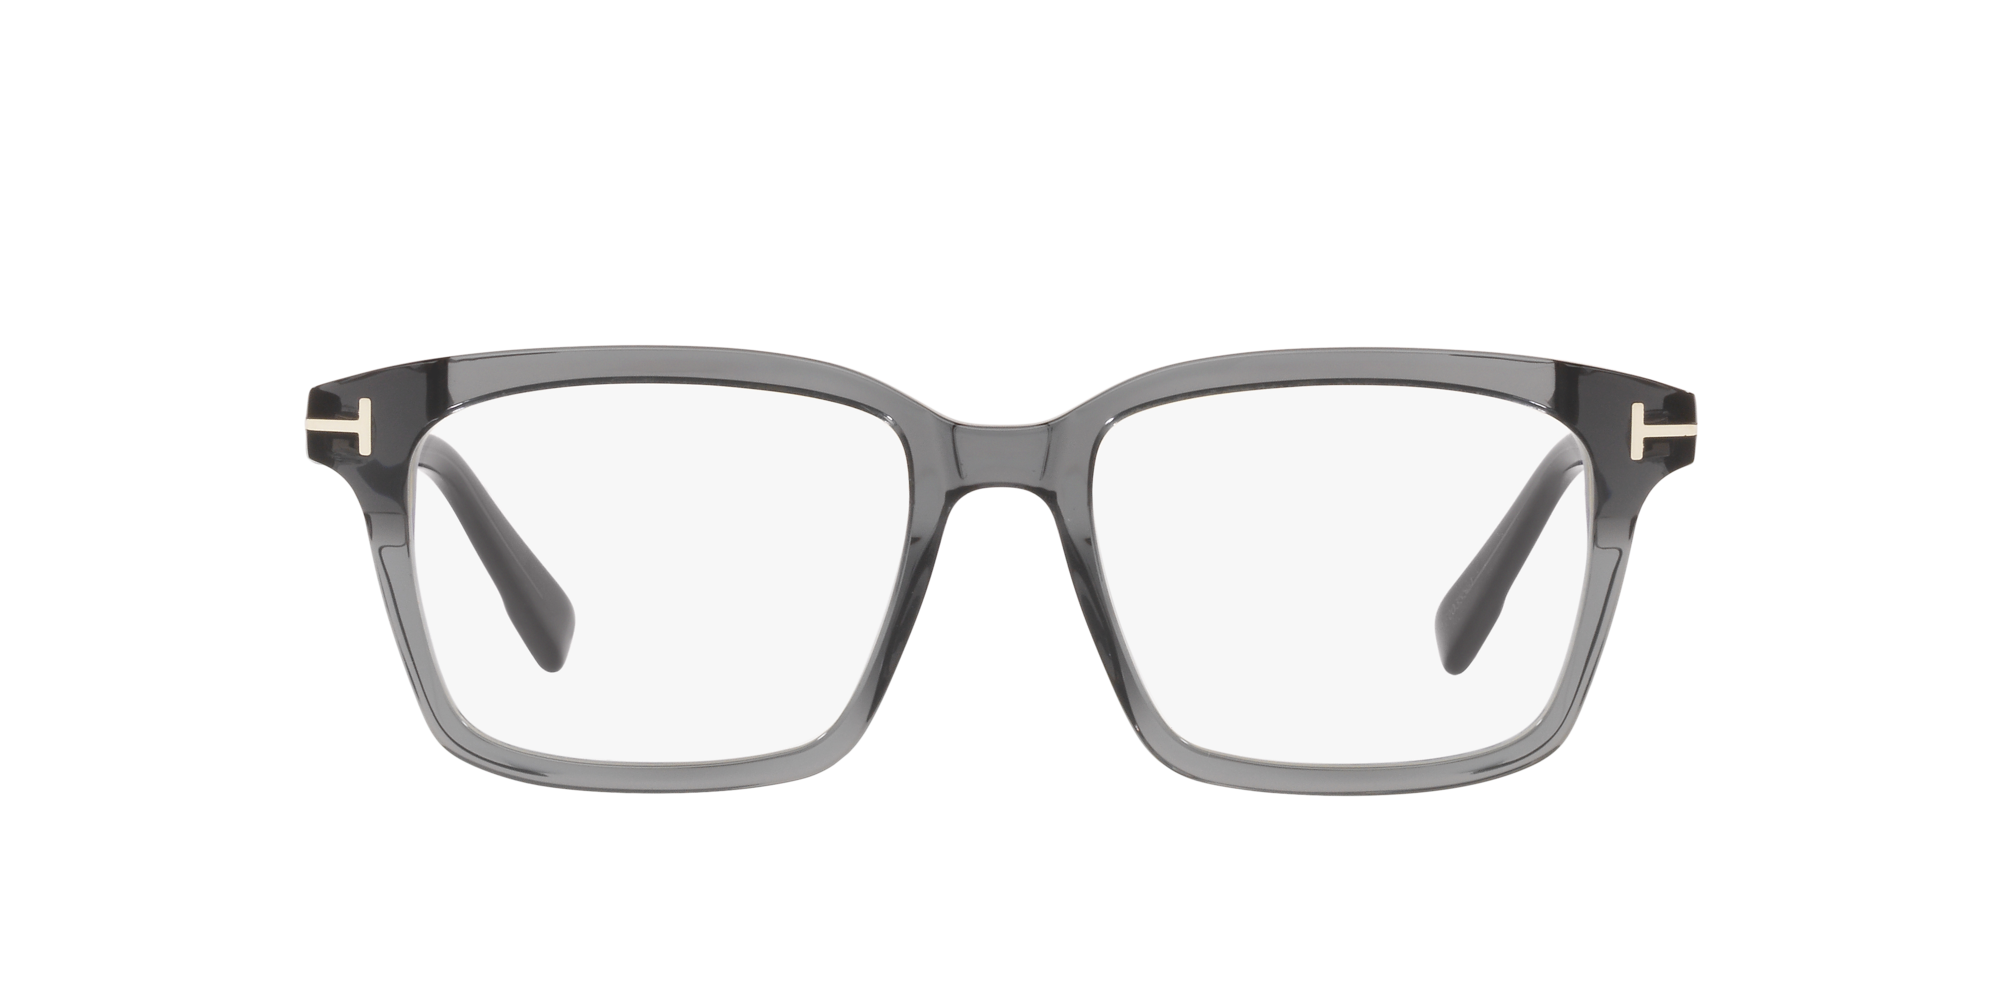 Image for FT5661-B from LensCrafters   Glasses, Prescription Glasses Online, Eyewear